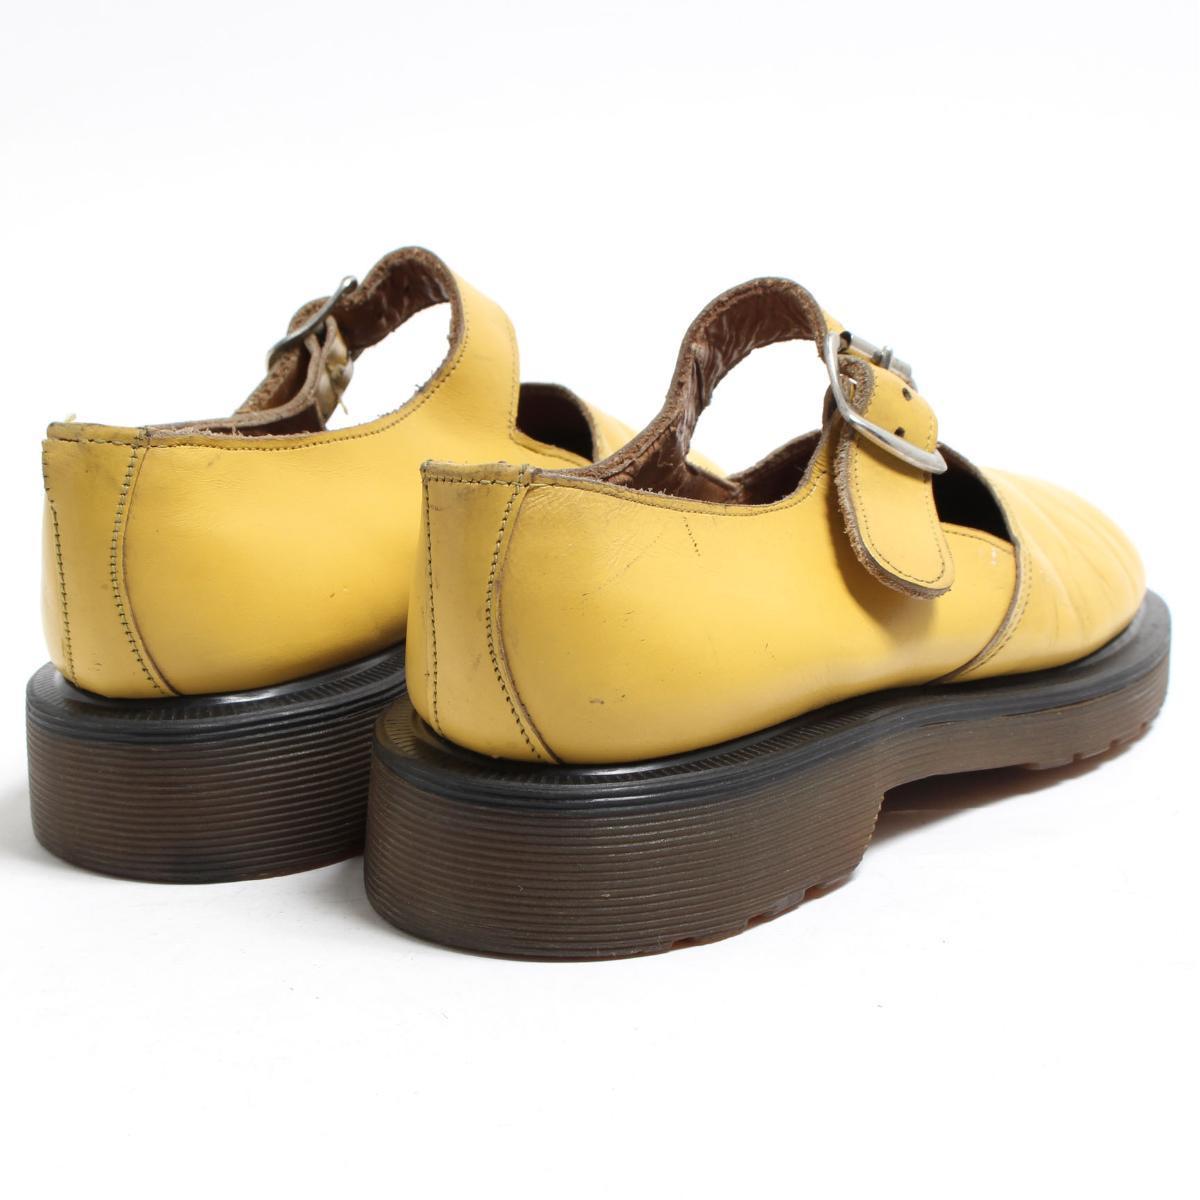 UK4 Lady's 22.5cm /bon7788 made in the doctor Martin Dr.Martens strap shoes U.K.